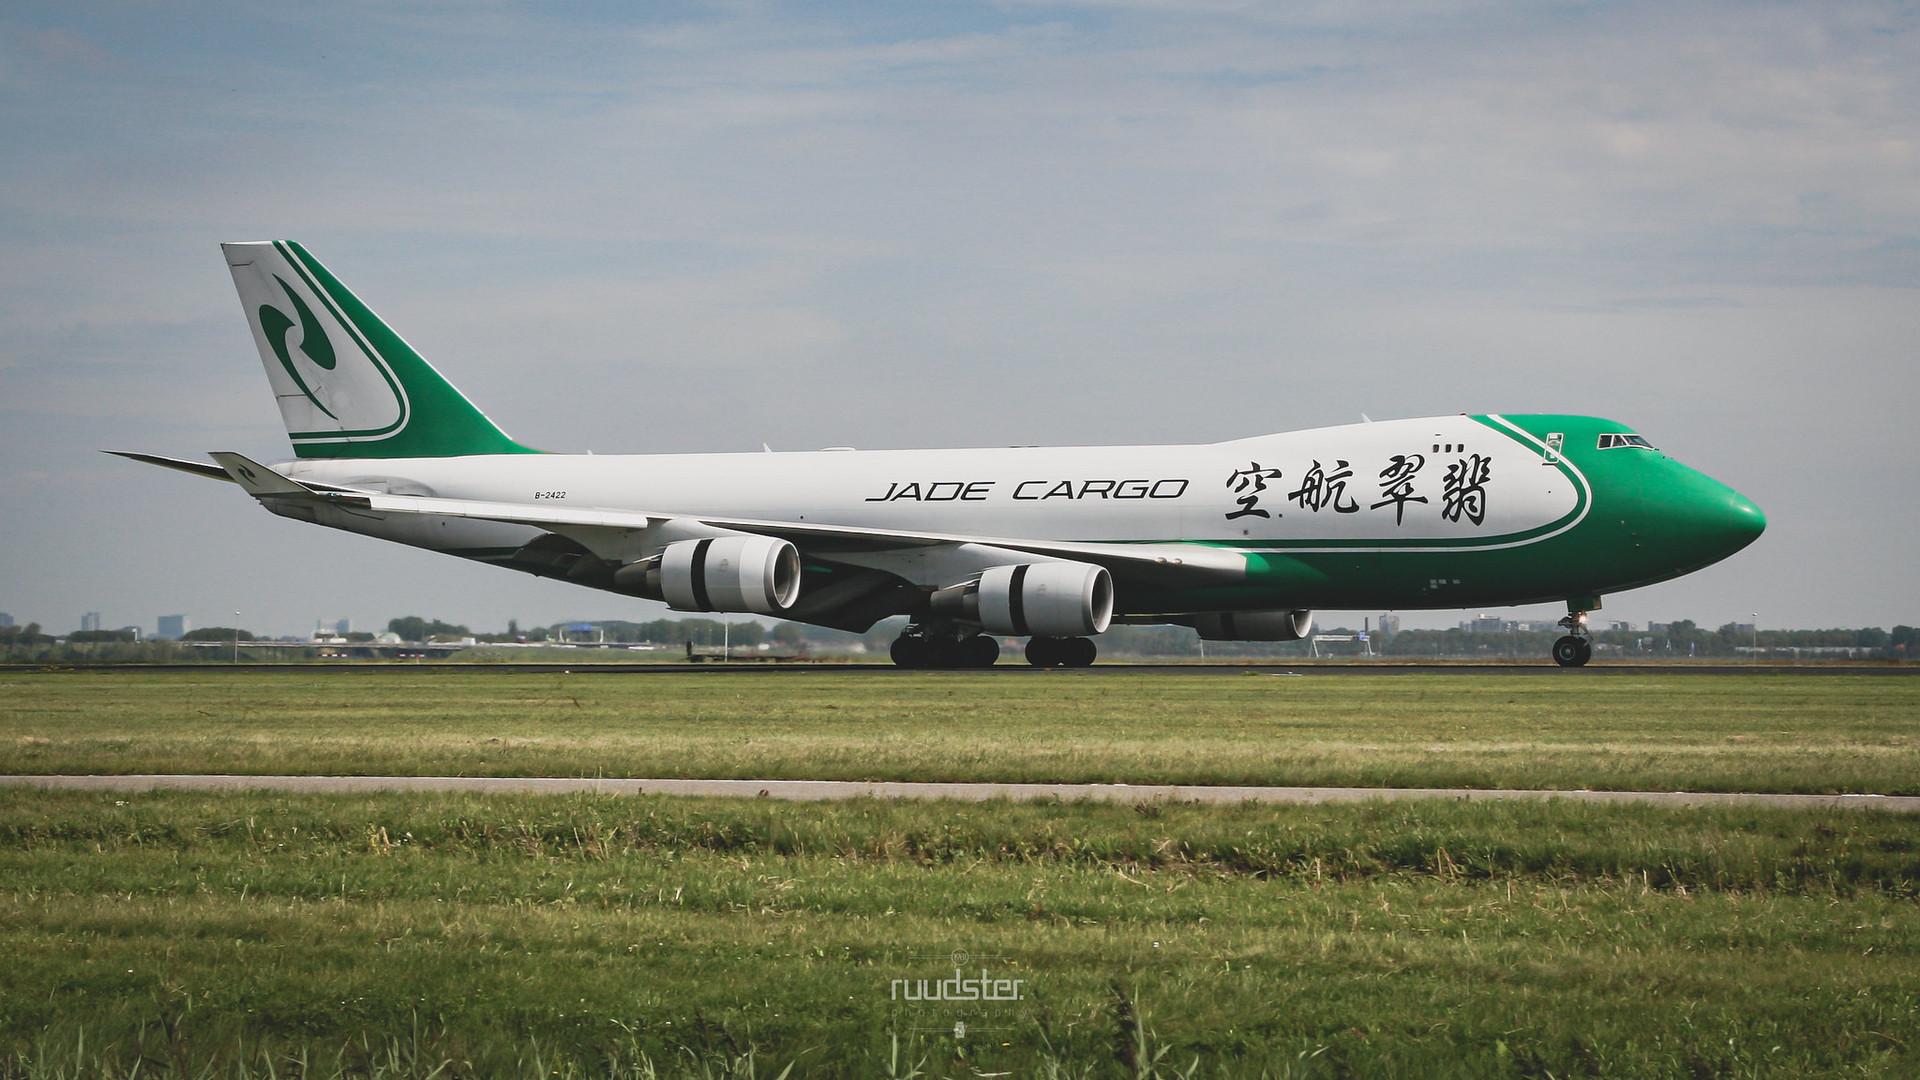 B-2422 | Build: 2007 - Boeing 747-400F